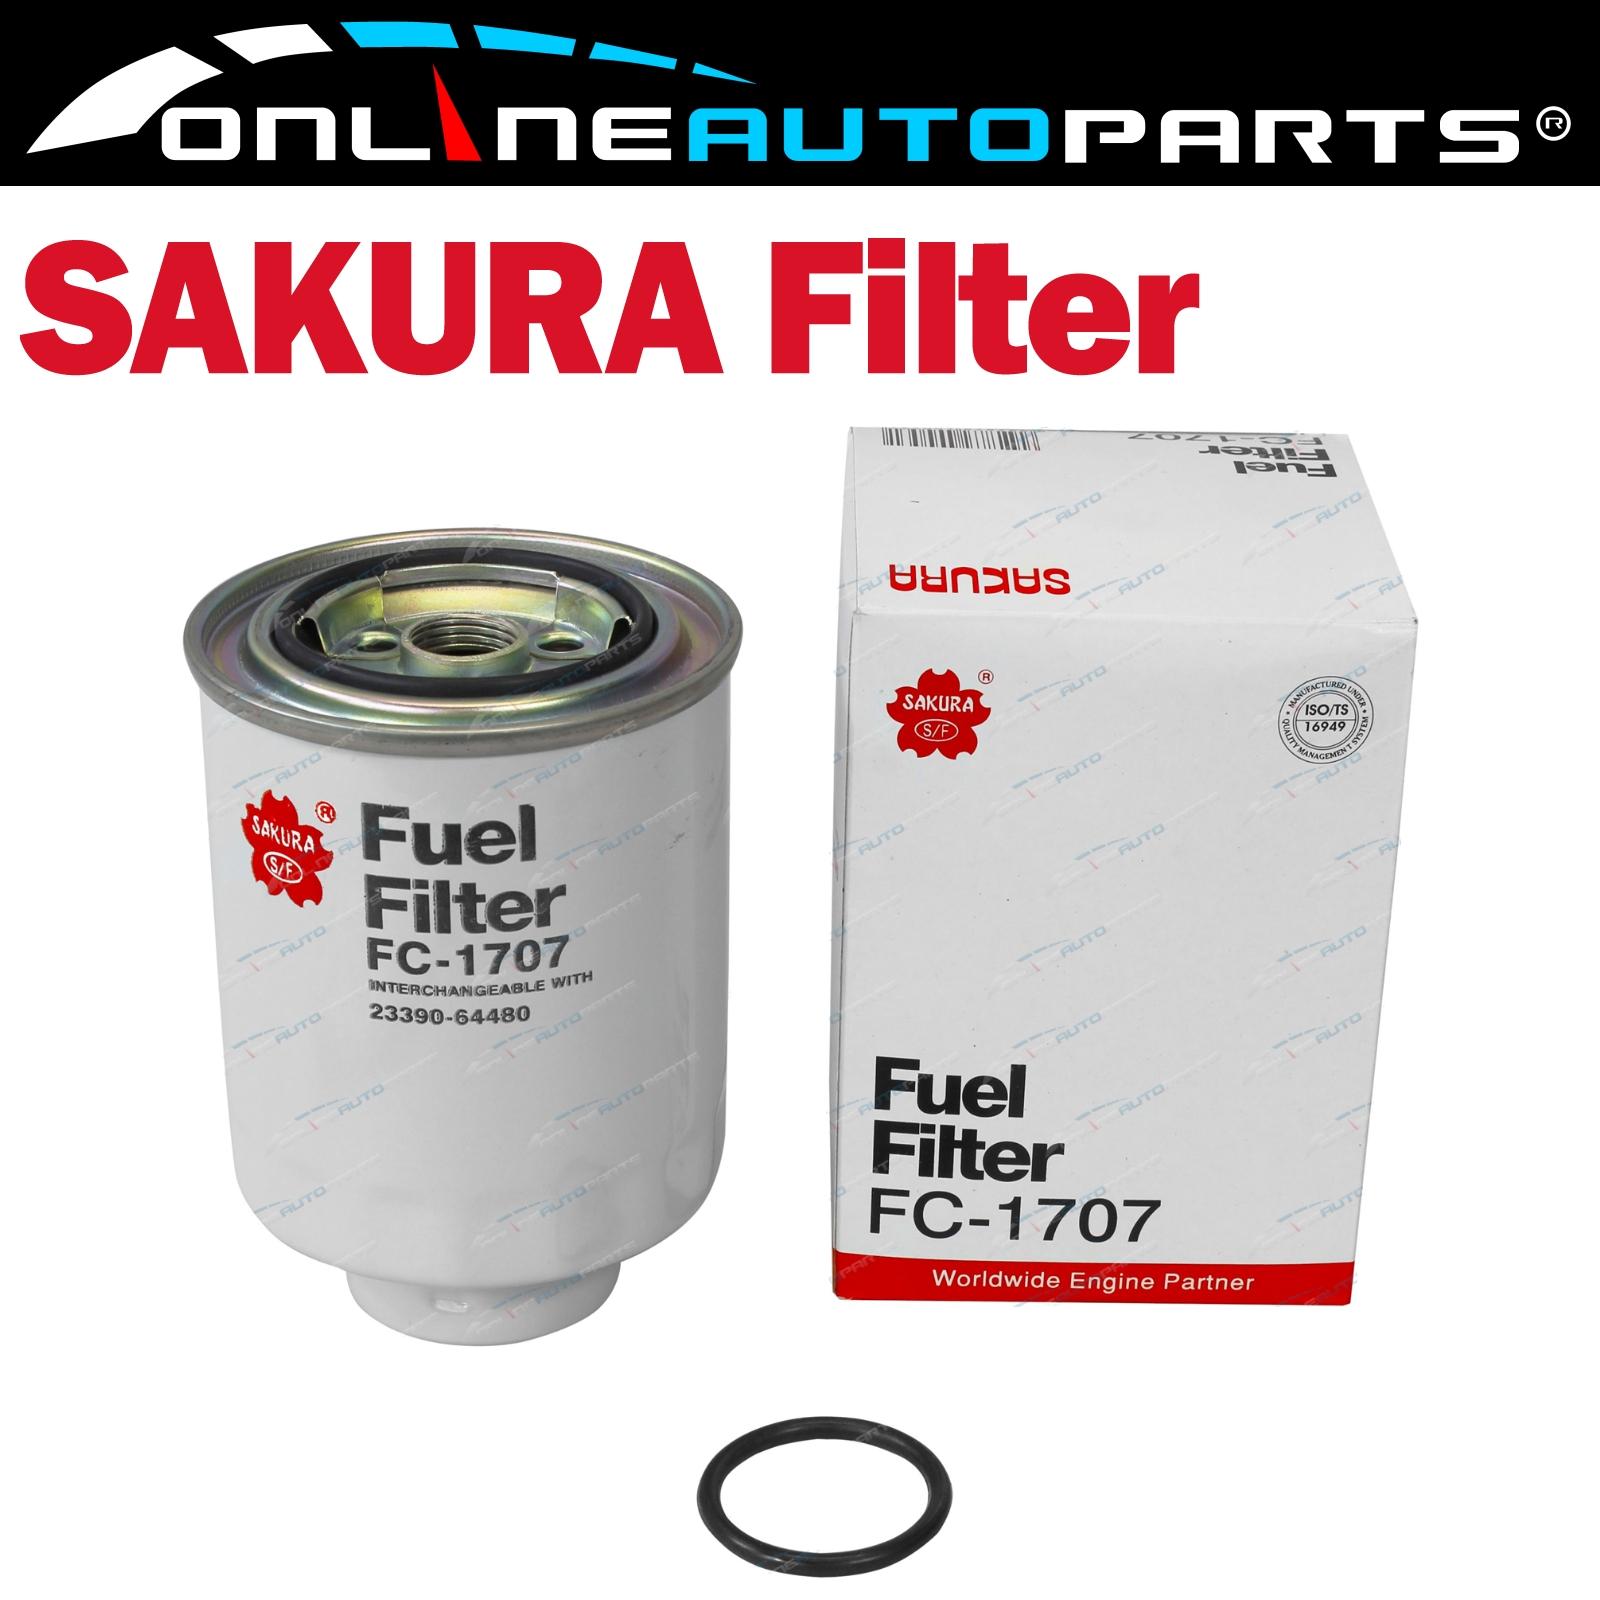 Diesel Fuel Filter Suits Toyota Landcruiser Hdj100 1hdfte 42l Filters For Engines Engine Fc 1707